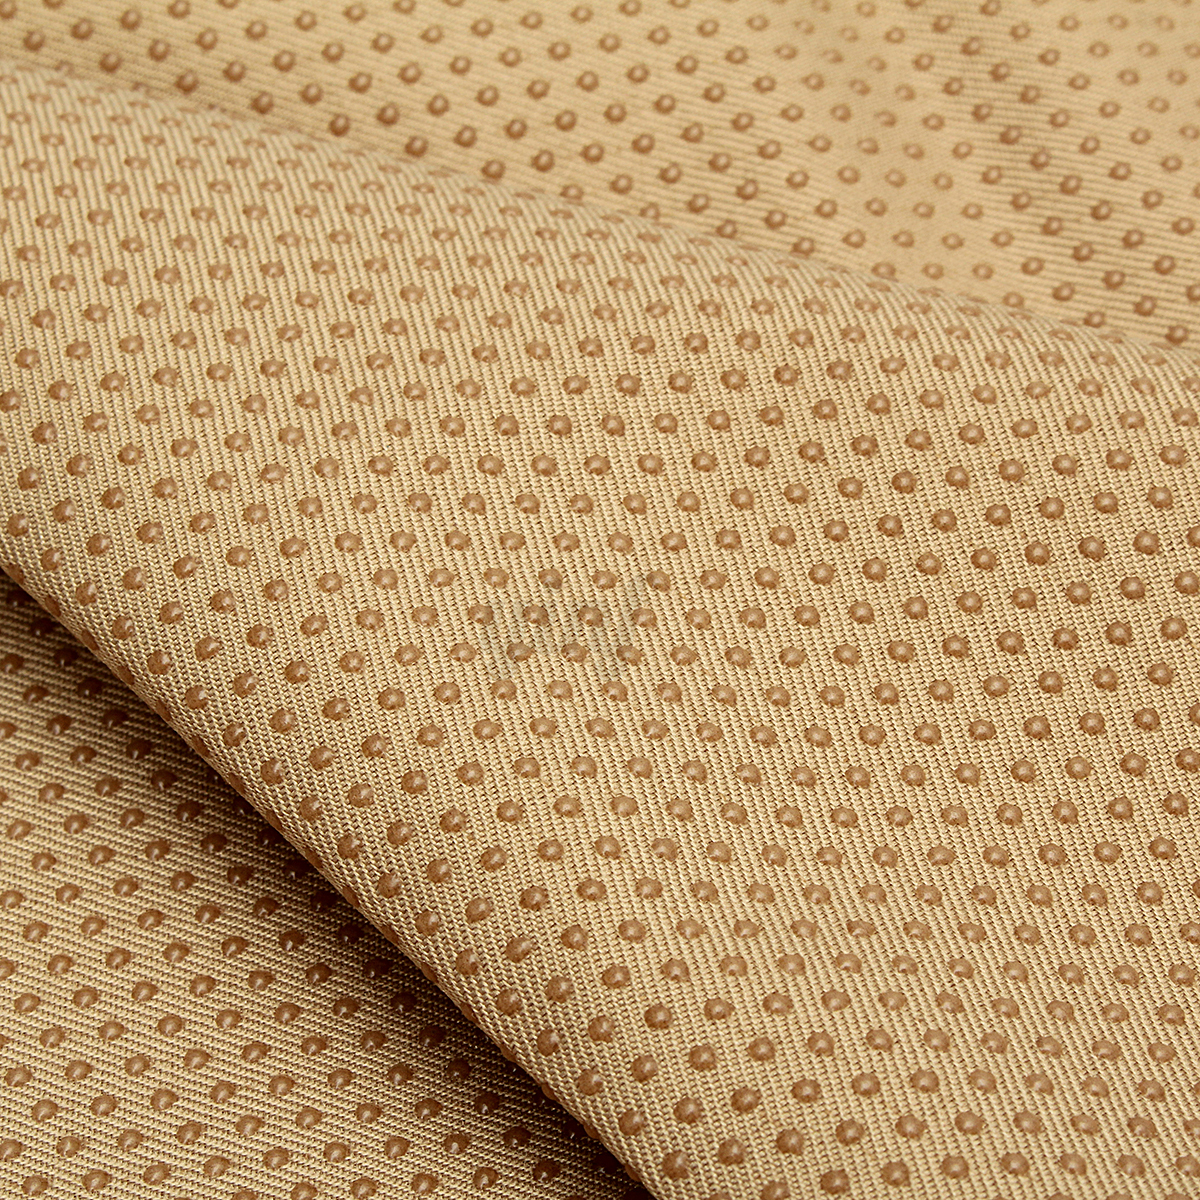 60 Anti Slip Vinyl Fabric Non Skid Dots Rubber Treated